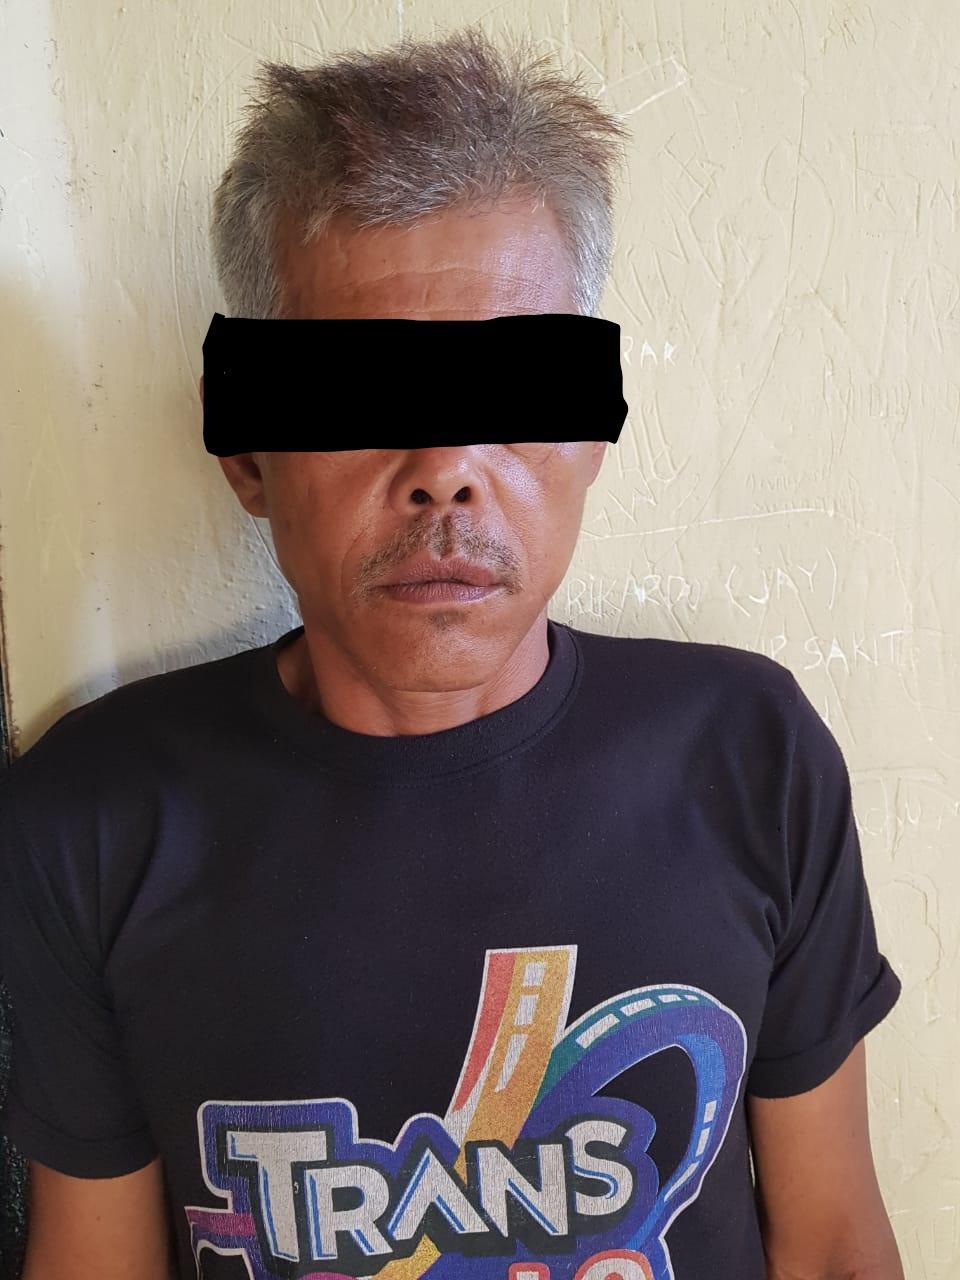 Ini Motif Terduga Pelaku Pembakar Rumah Istrinya Sendiri, Yang Berhasil Diamankan Polres Kepahiang Polda Bengkulu